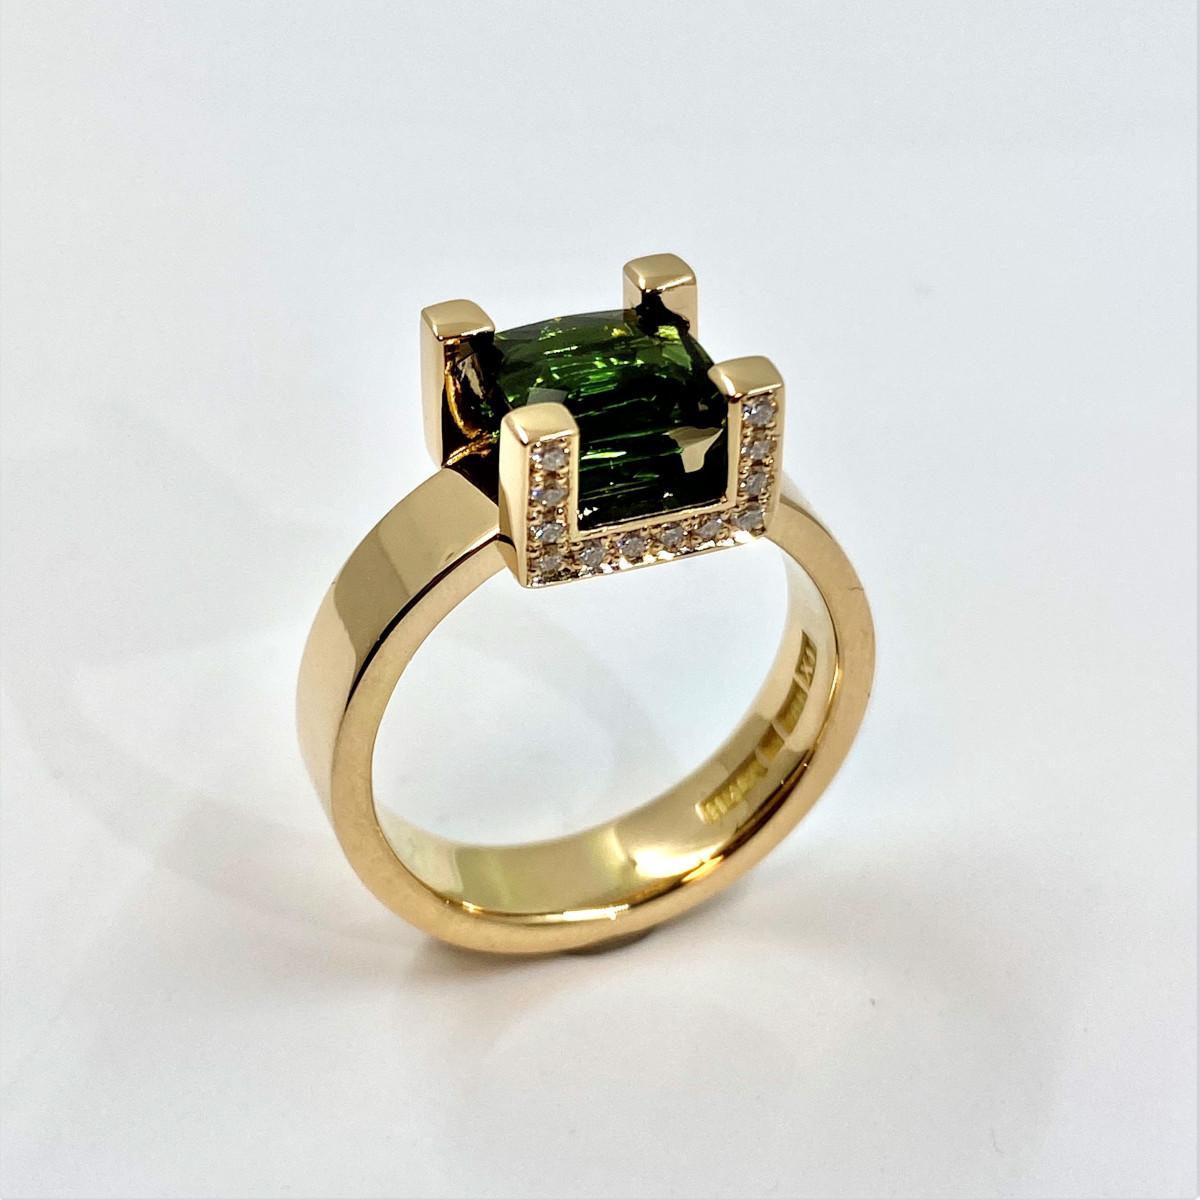 Grön sten, grön turmalin, stenring, diamantring